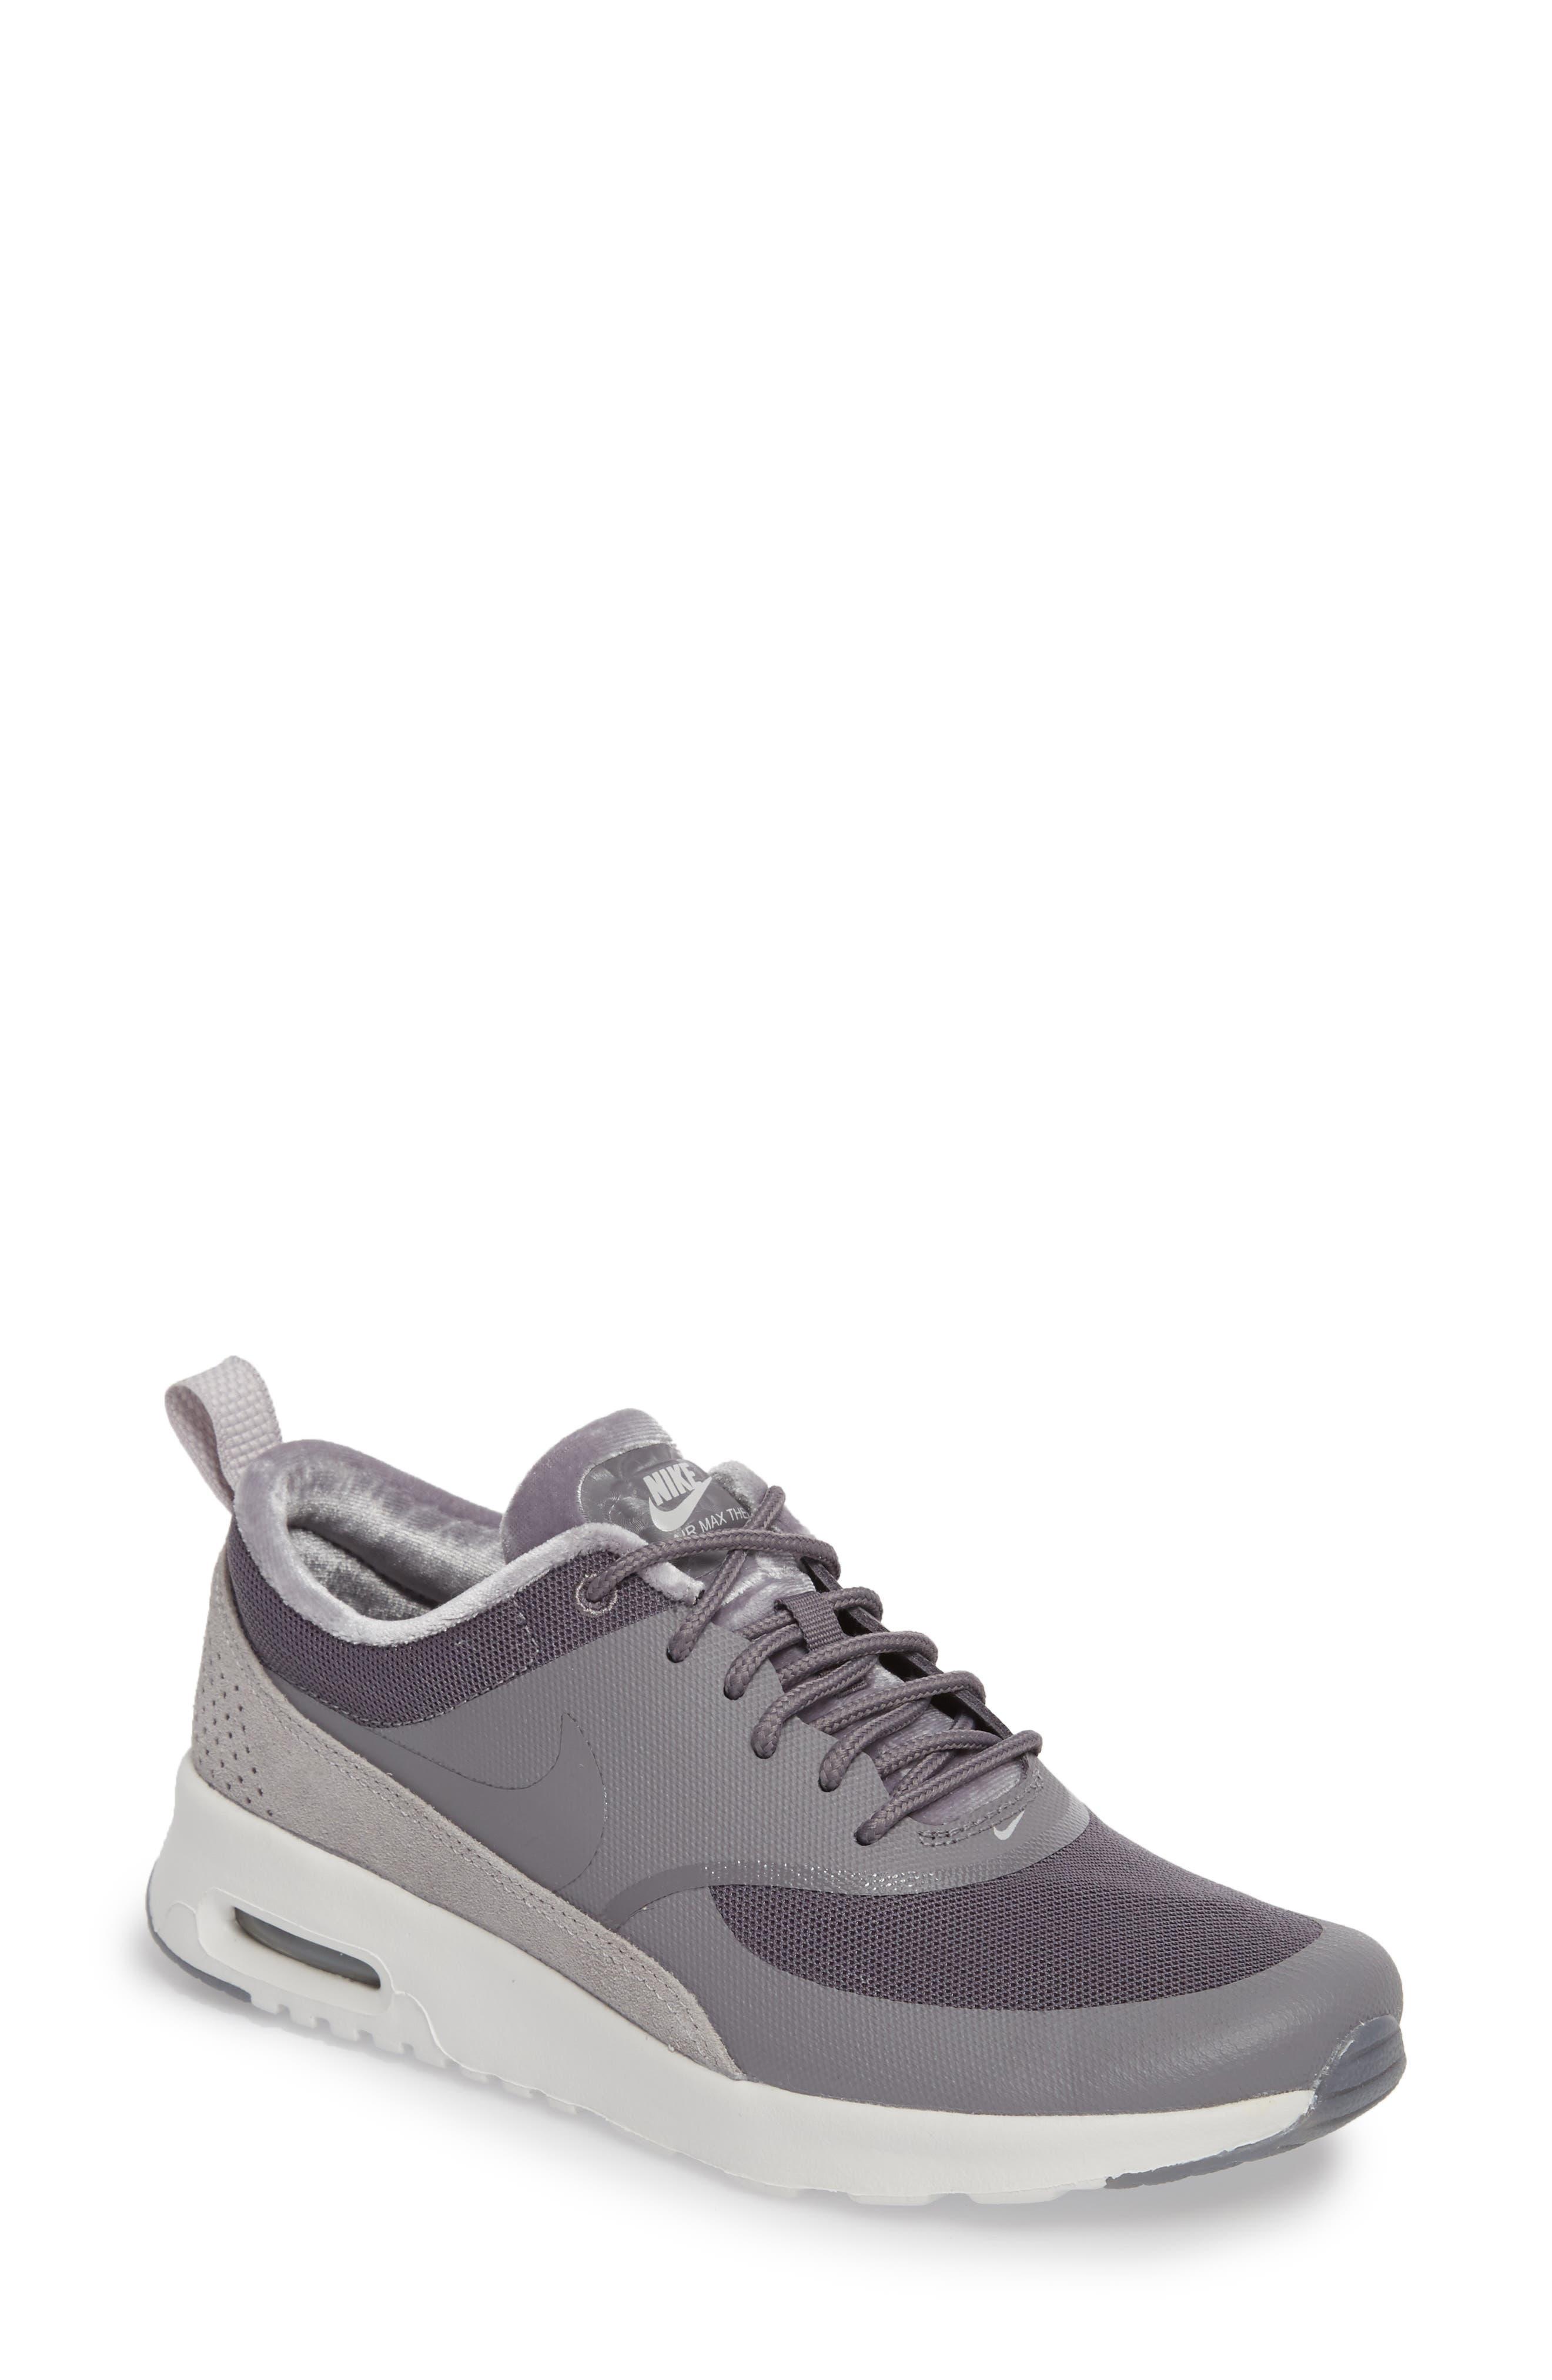 Air Max Thea LX Sneaker,                             Main thumbnail 1, color,                             022